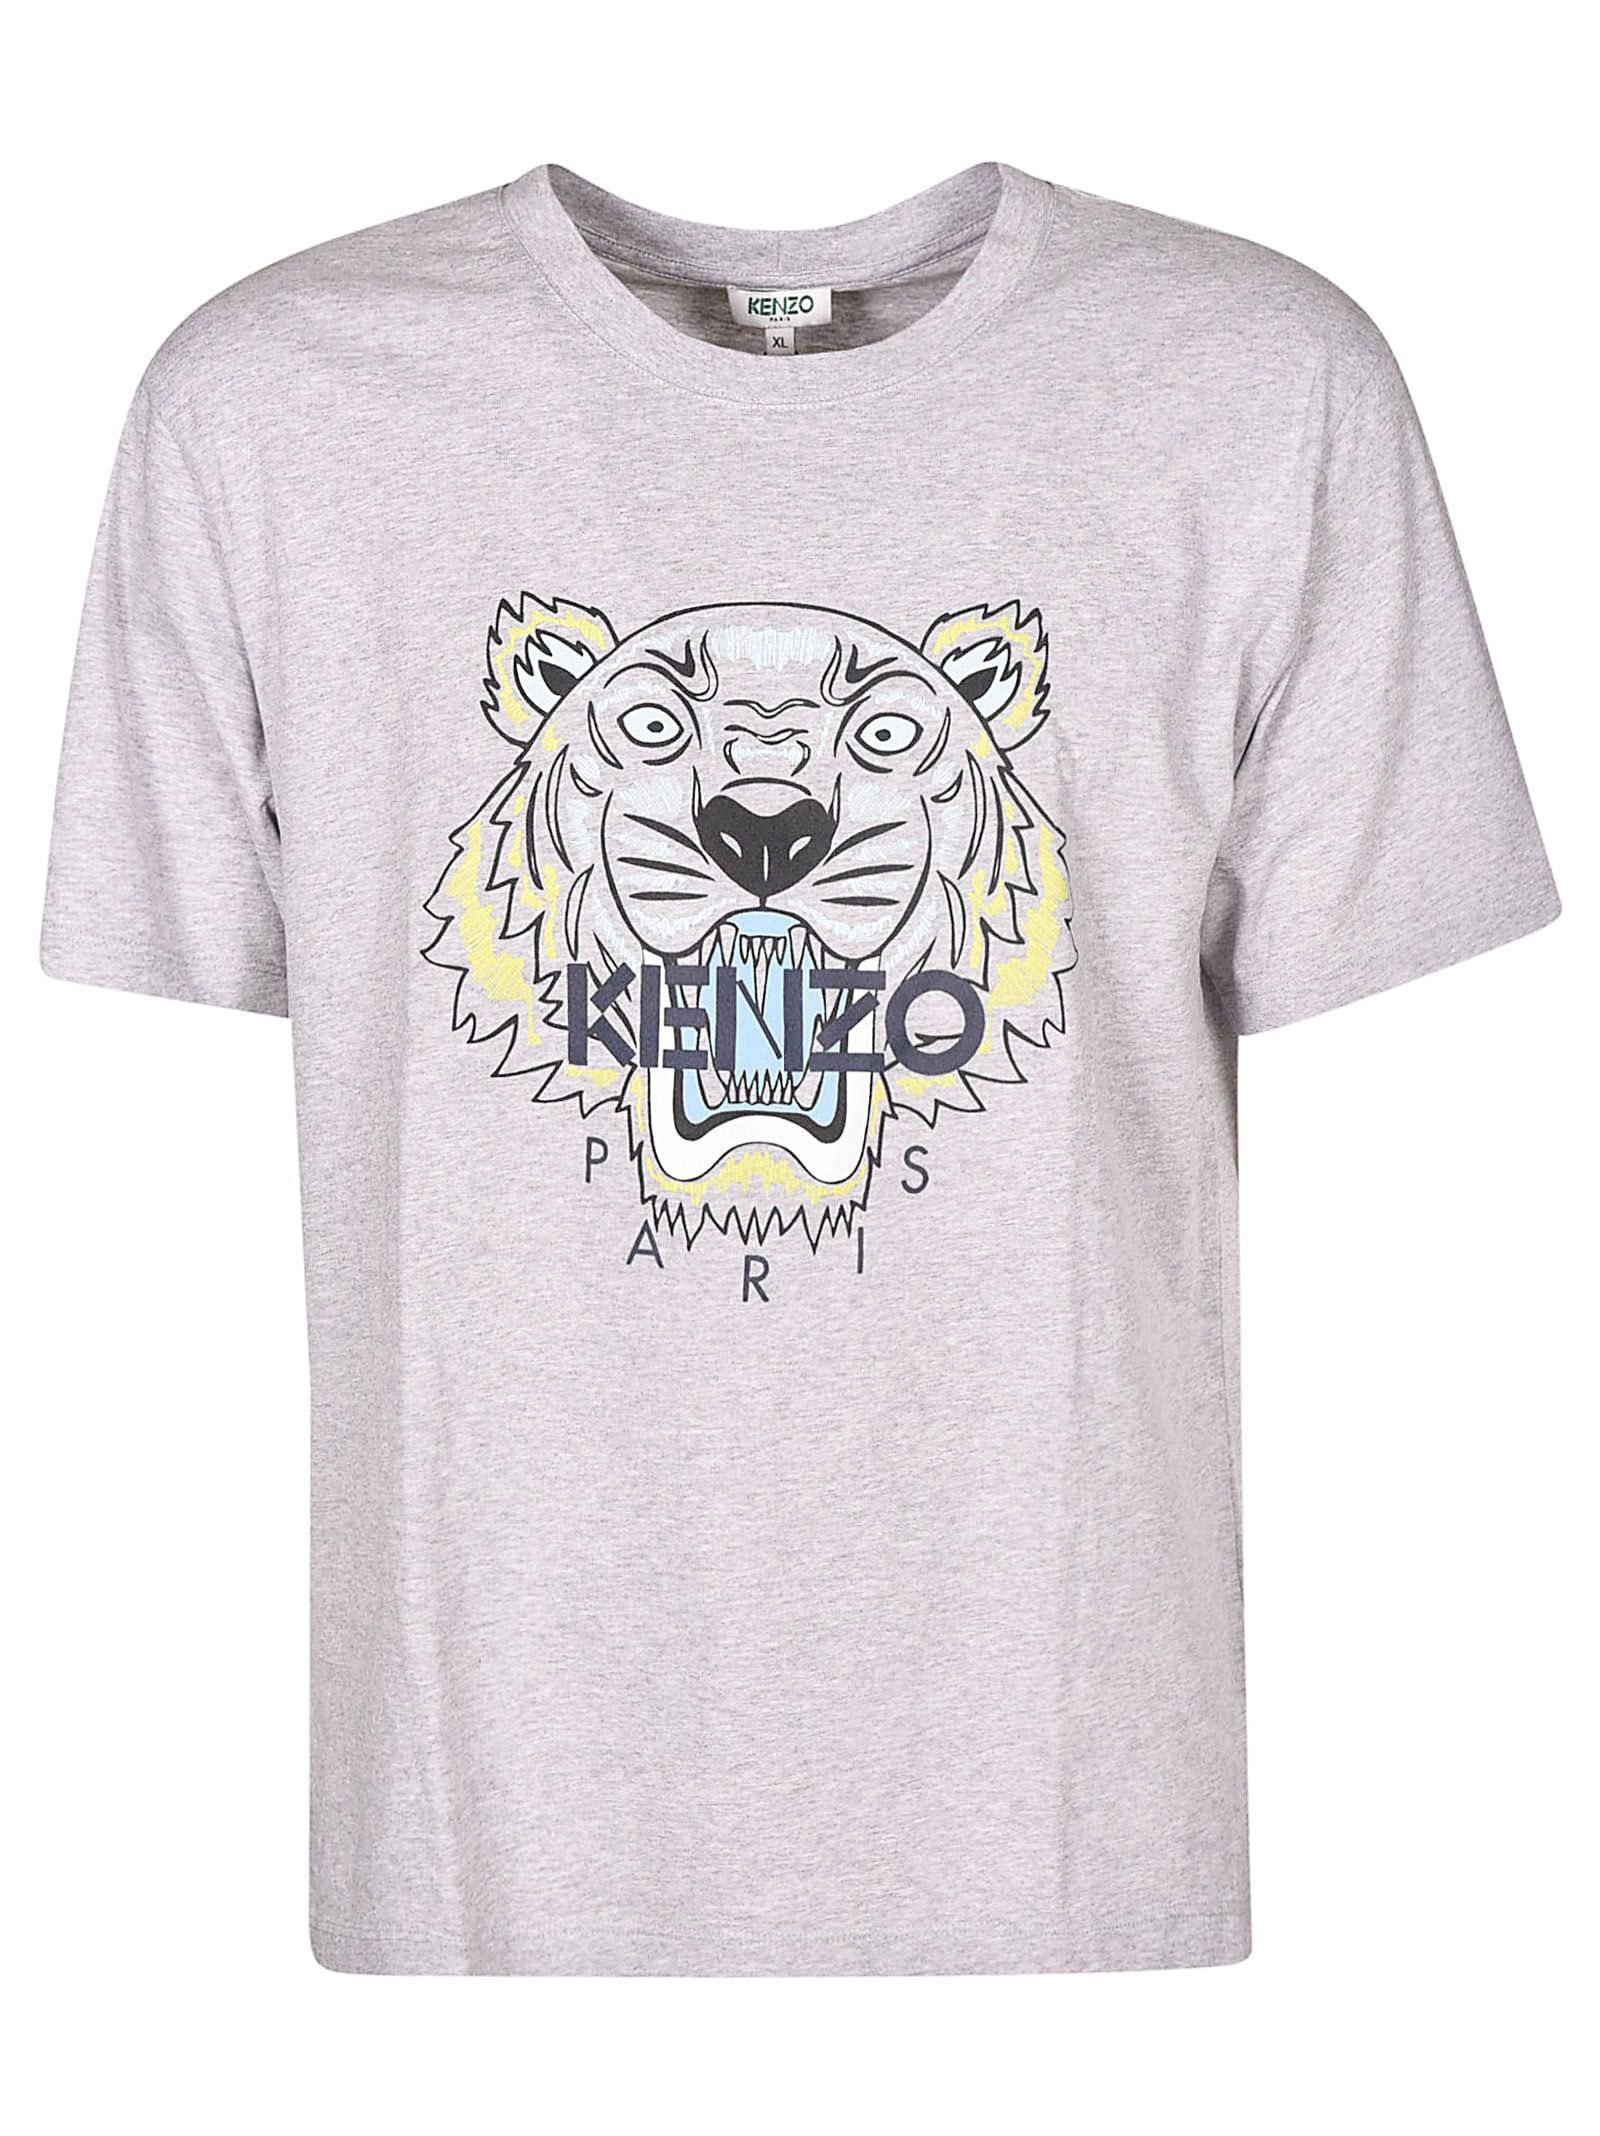 cf11763f Kenzo Kenzo Tiger Logo Print T-shirt - Gray - 10870388 | italist